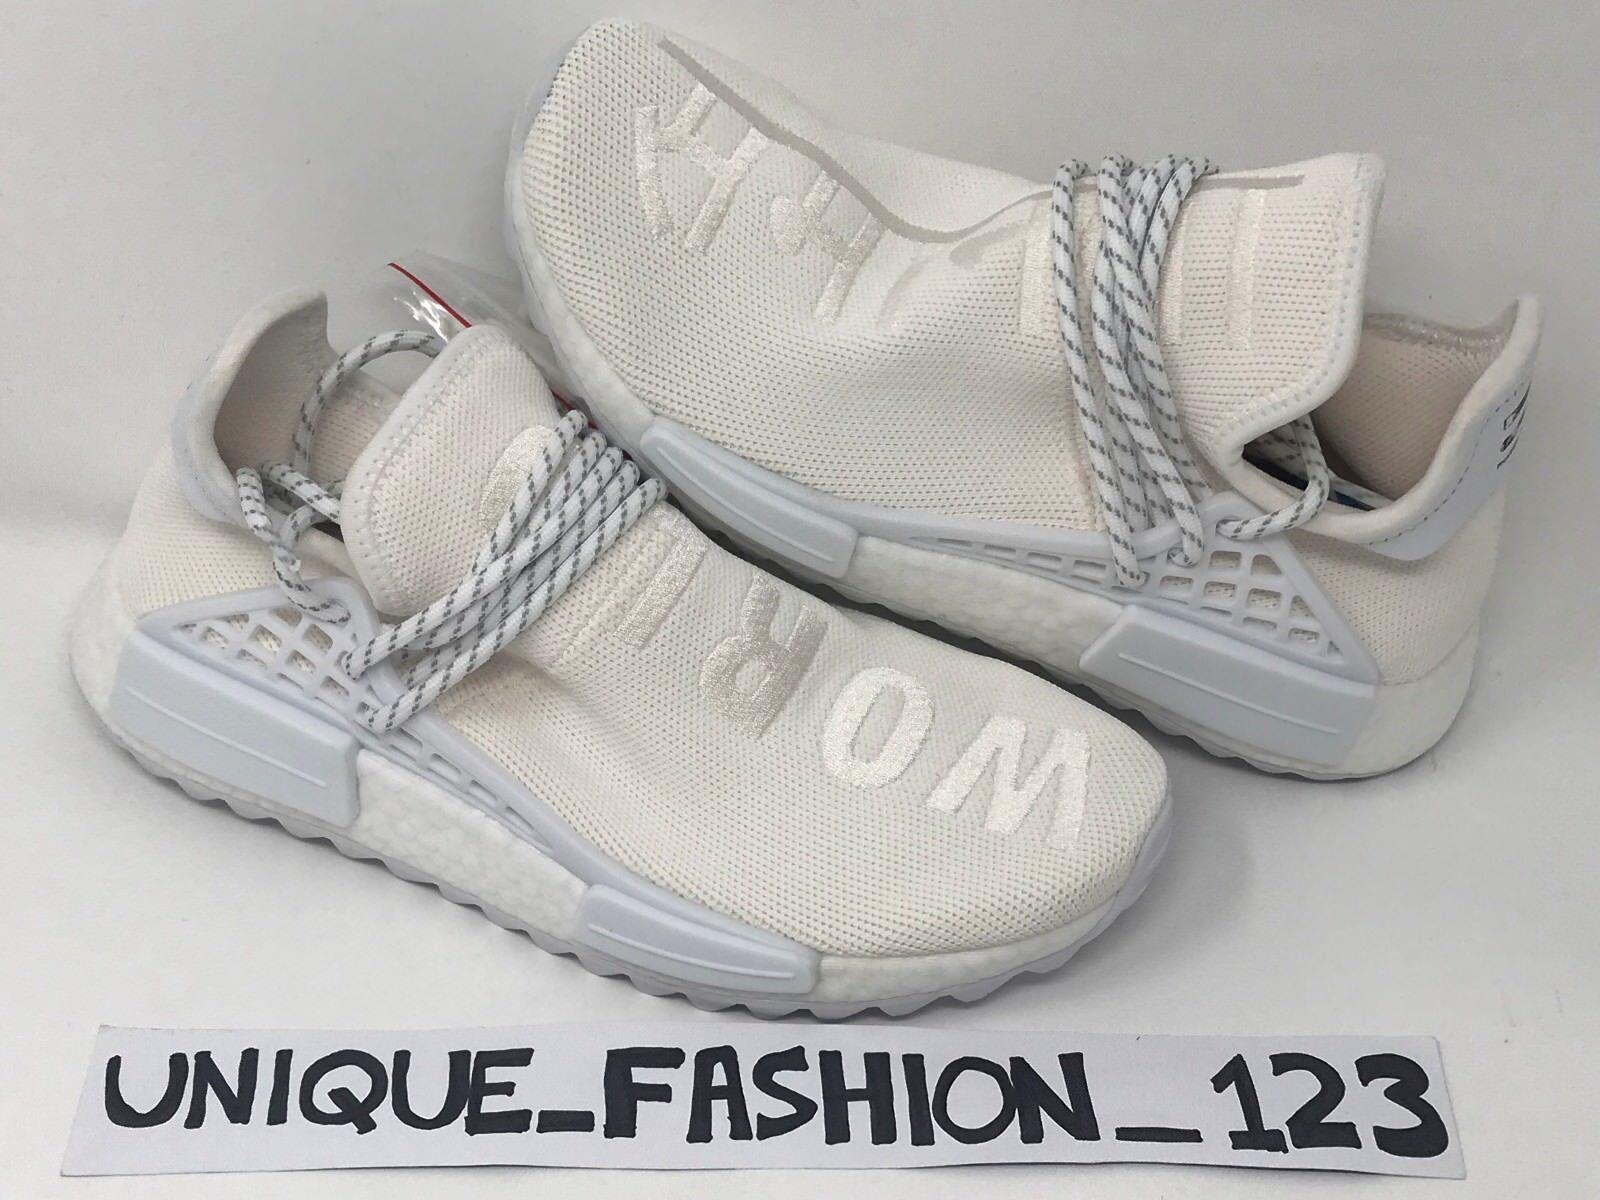 Adidas NMD raza humana x Pharrell Hu PW 6 7 Holi 8 9 10 Trail Holi 7 lienzo en blanco blanco 5cb905